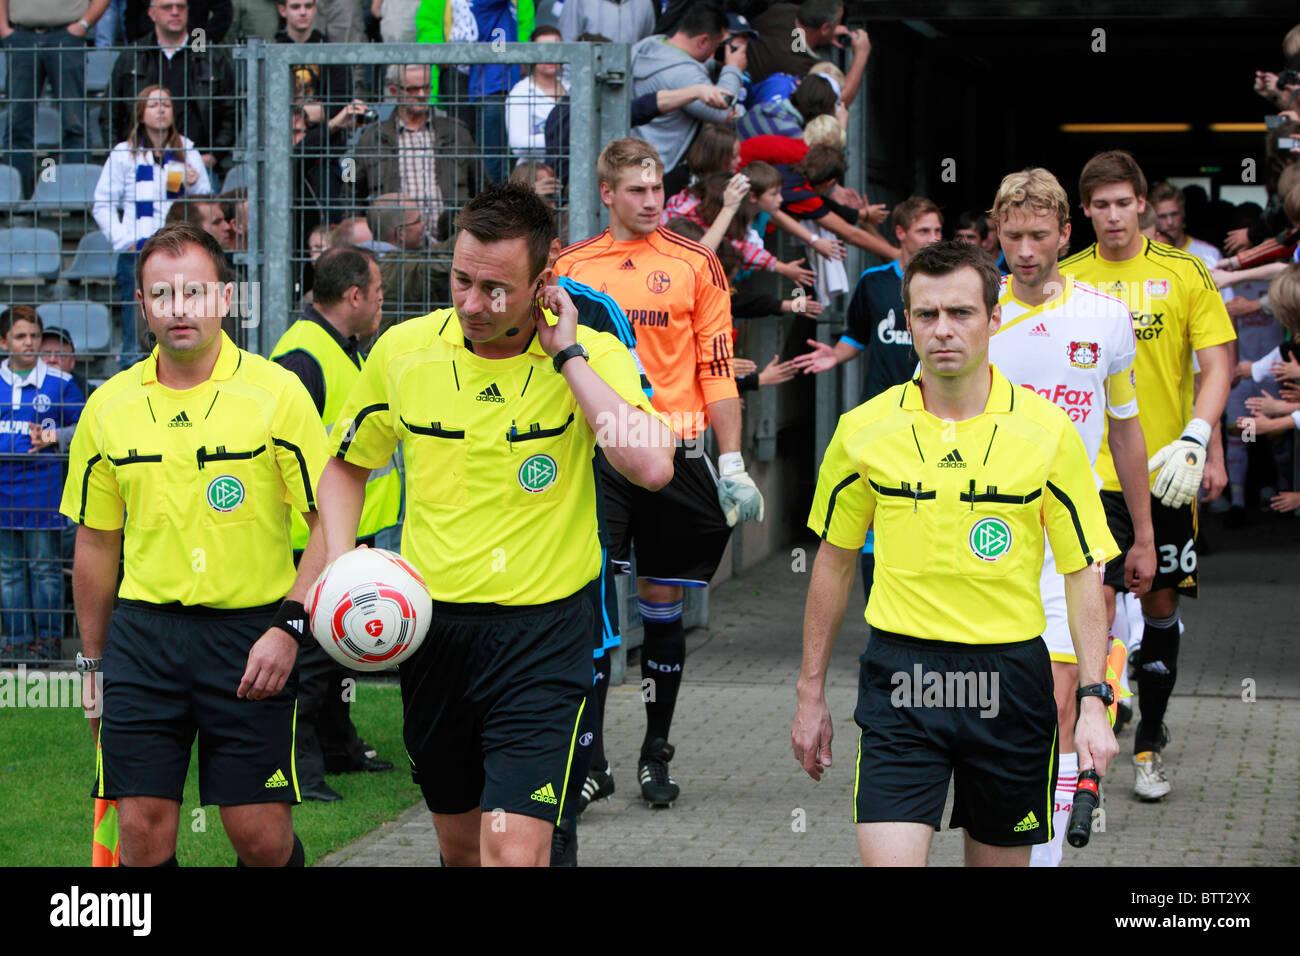 sports, football, Bundesliga, 2010/2011, friendly match 2010, Bayer 04 Leverkusen versus FC Schalke 04 4:0, Stadium - Stock Image